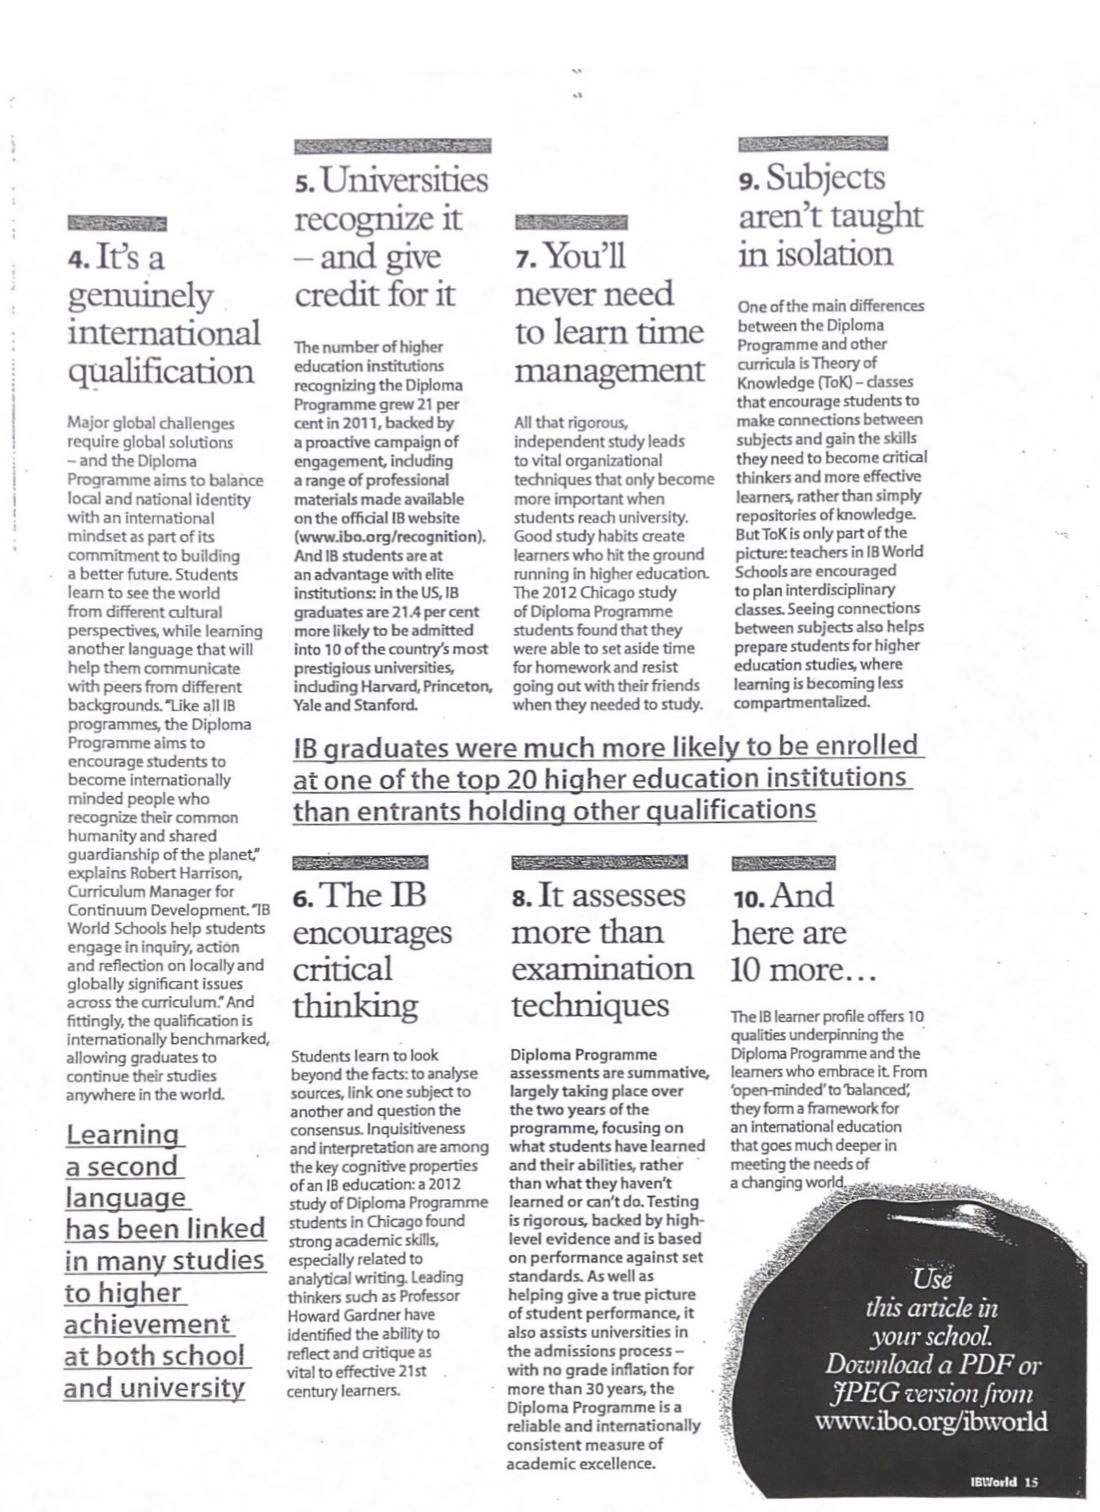 10 Reasons Why IB DP Page 2.jpg